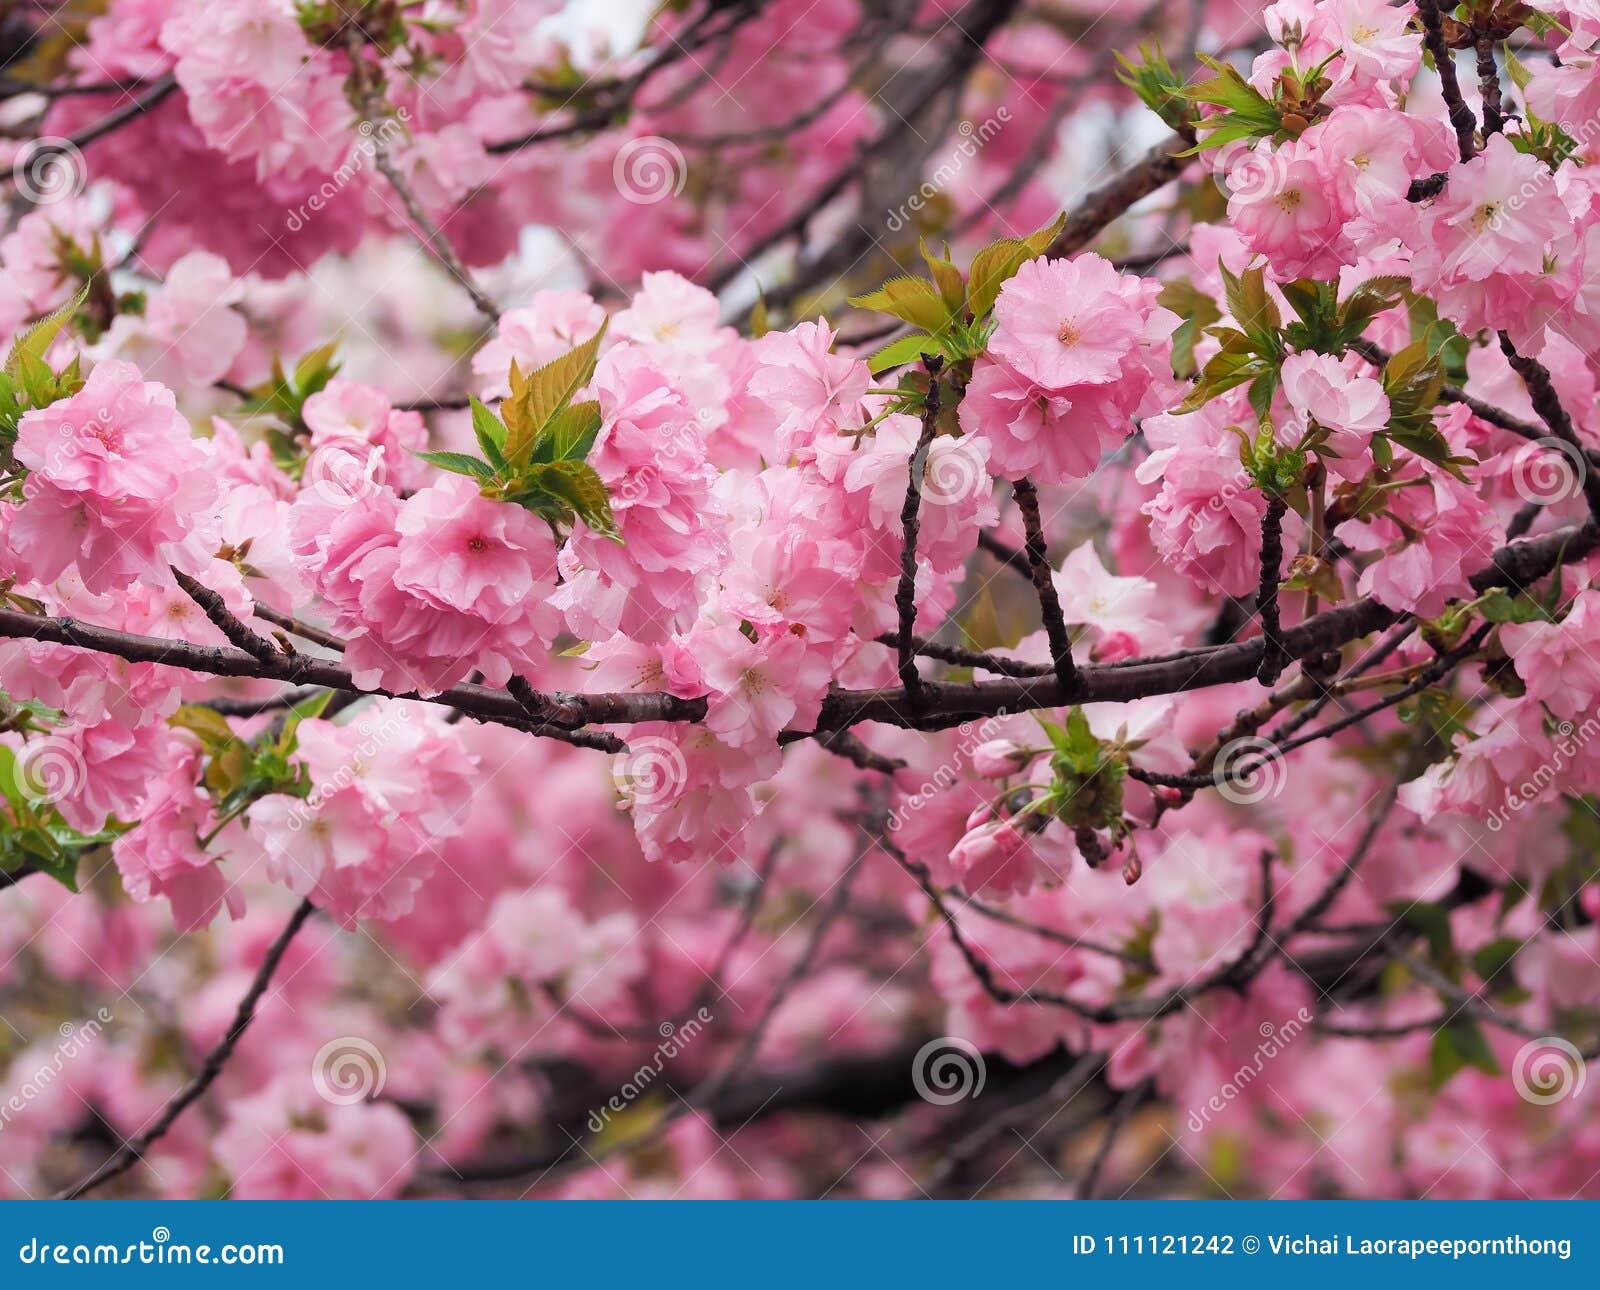 Beautiful Pink Sakura Flowers In Japan Stock Photo Image Of Bright